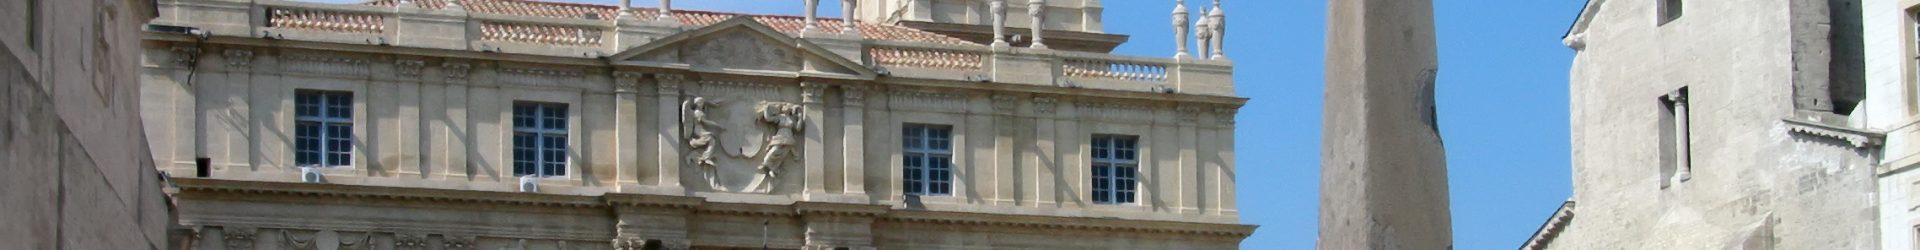 Pasqua in Provenza e Camargue, Arles, Sainte Marie de La Mer, Aigues Mortes, Avignone, Les Beaux de Provence e Nimes